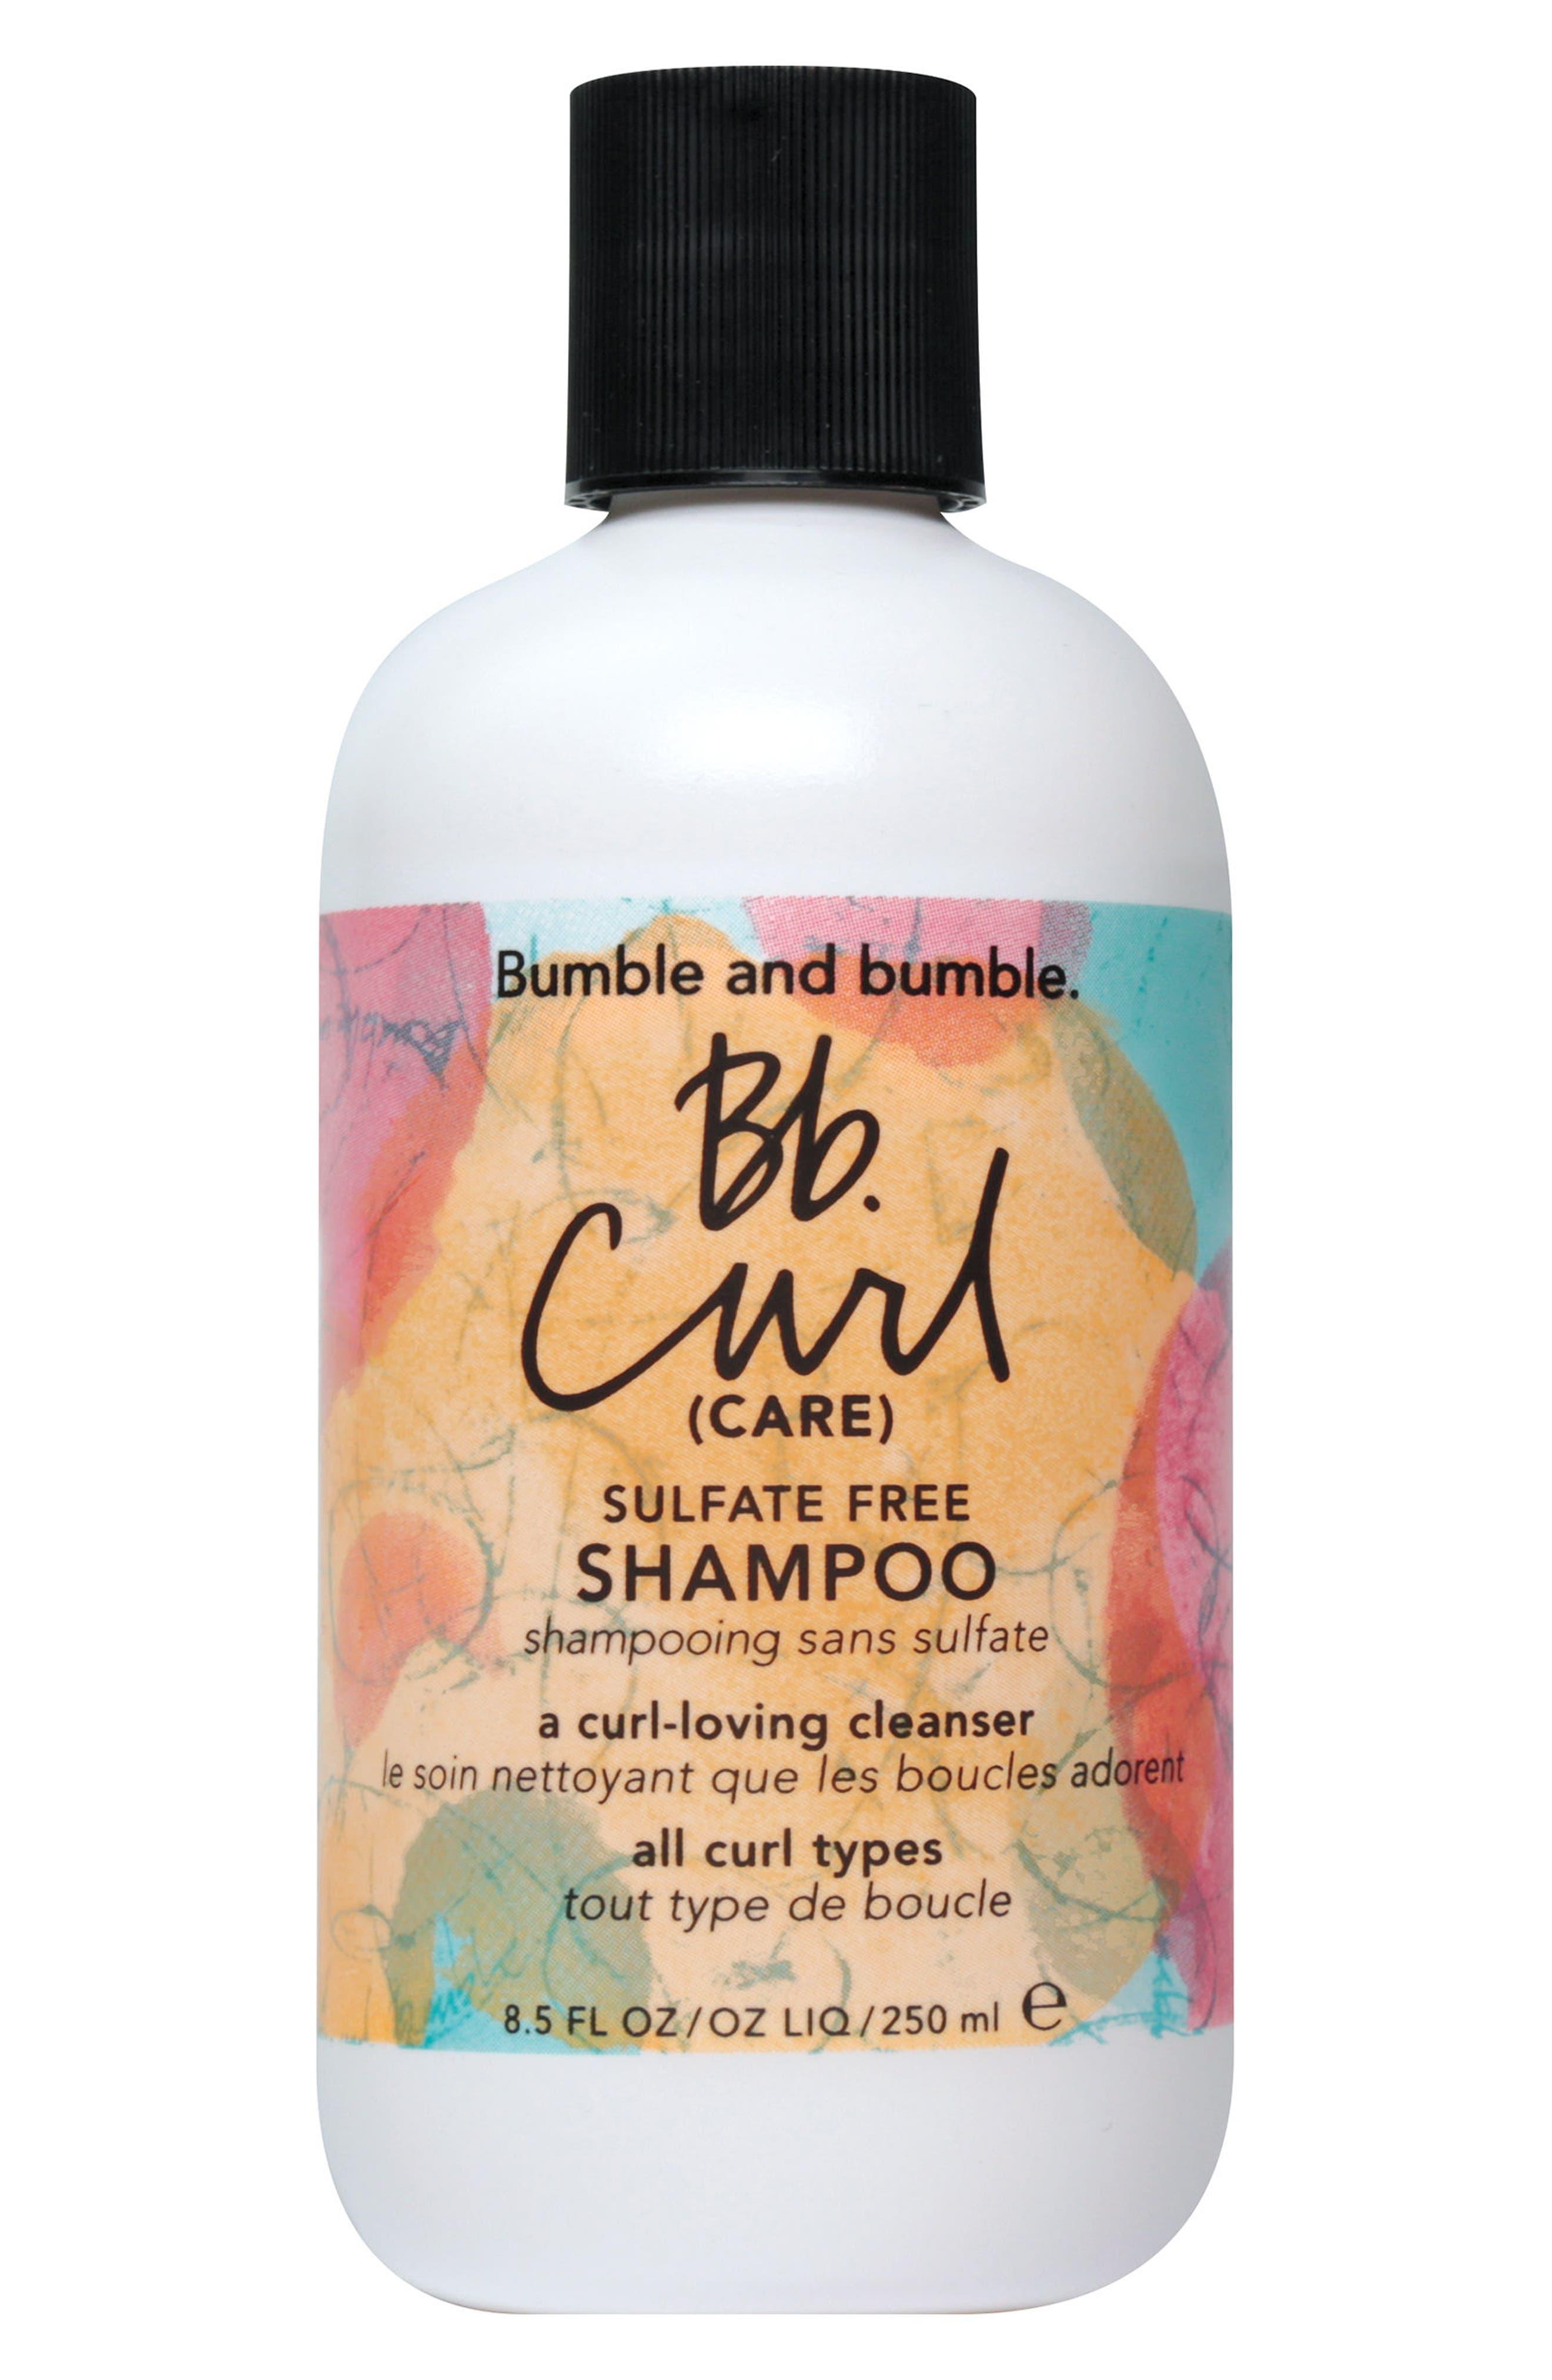 BUMBLE AND BUMBLE., Bumble and bumble Curl Shampoo, Main thumbnail 1, color, NO COLOR